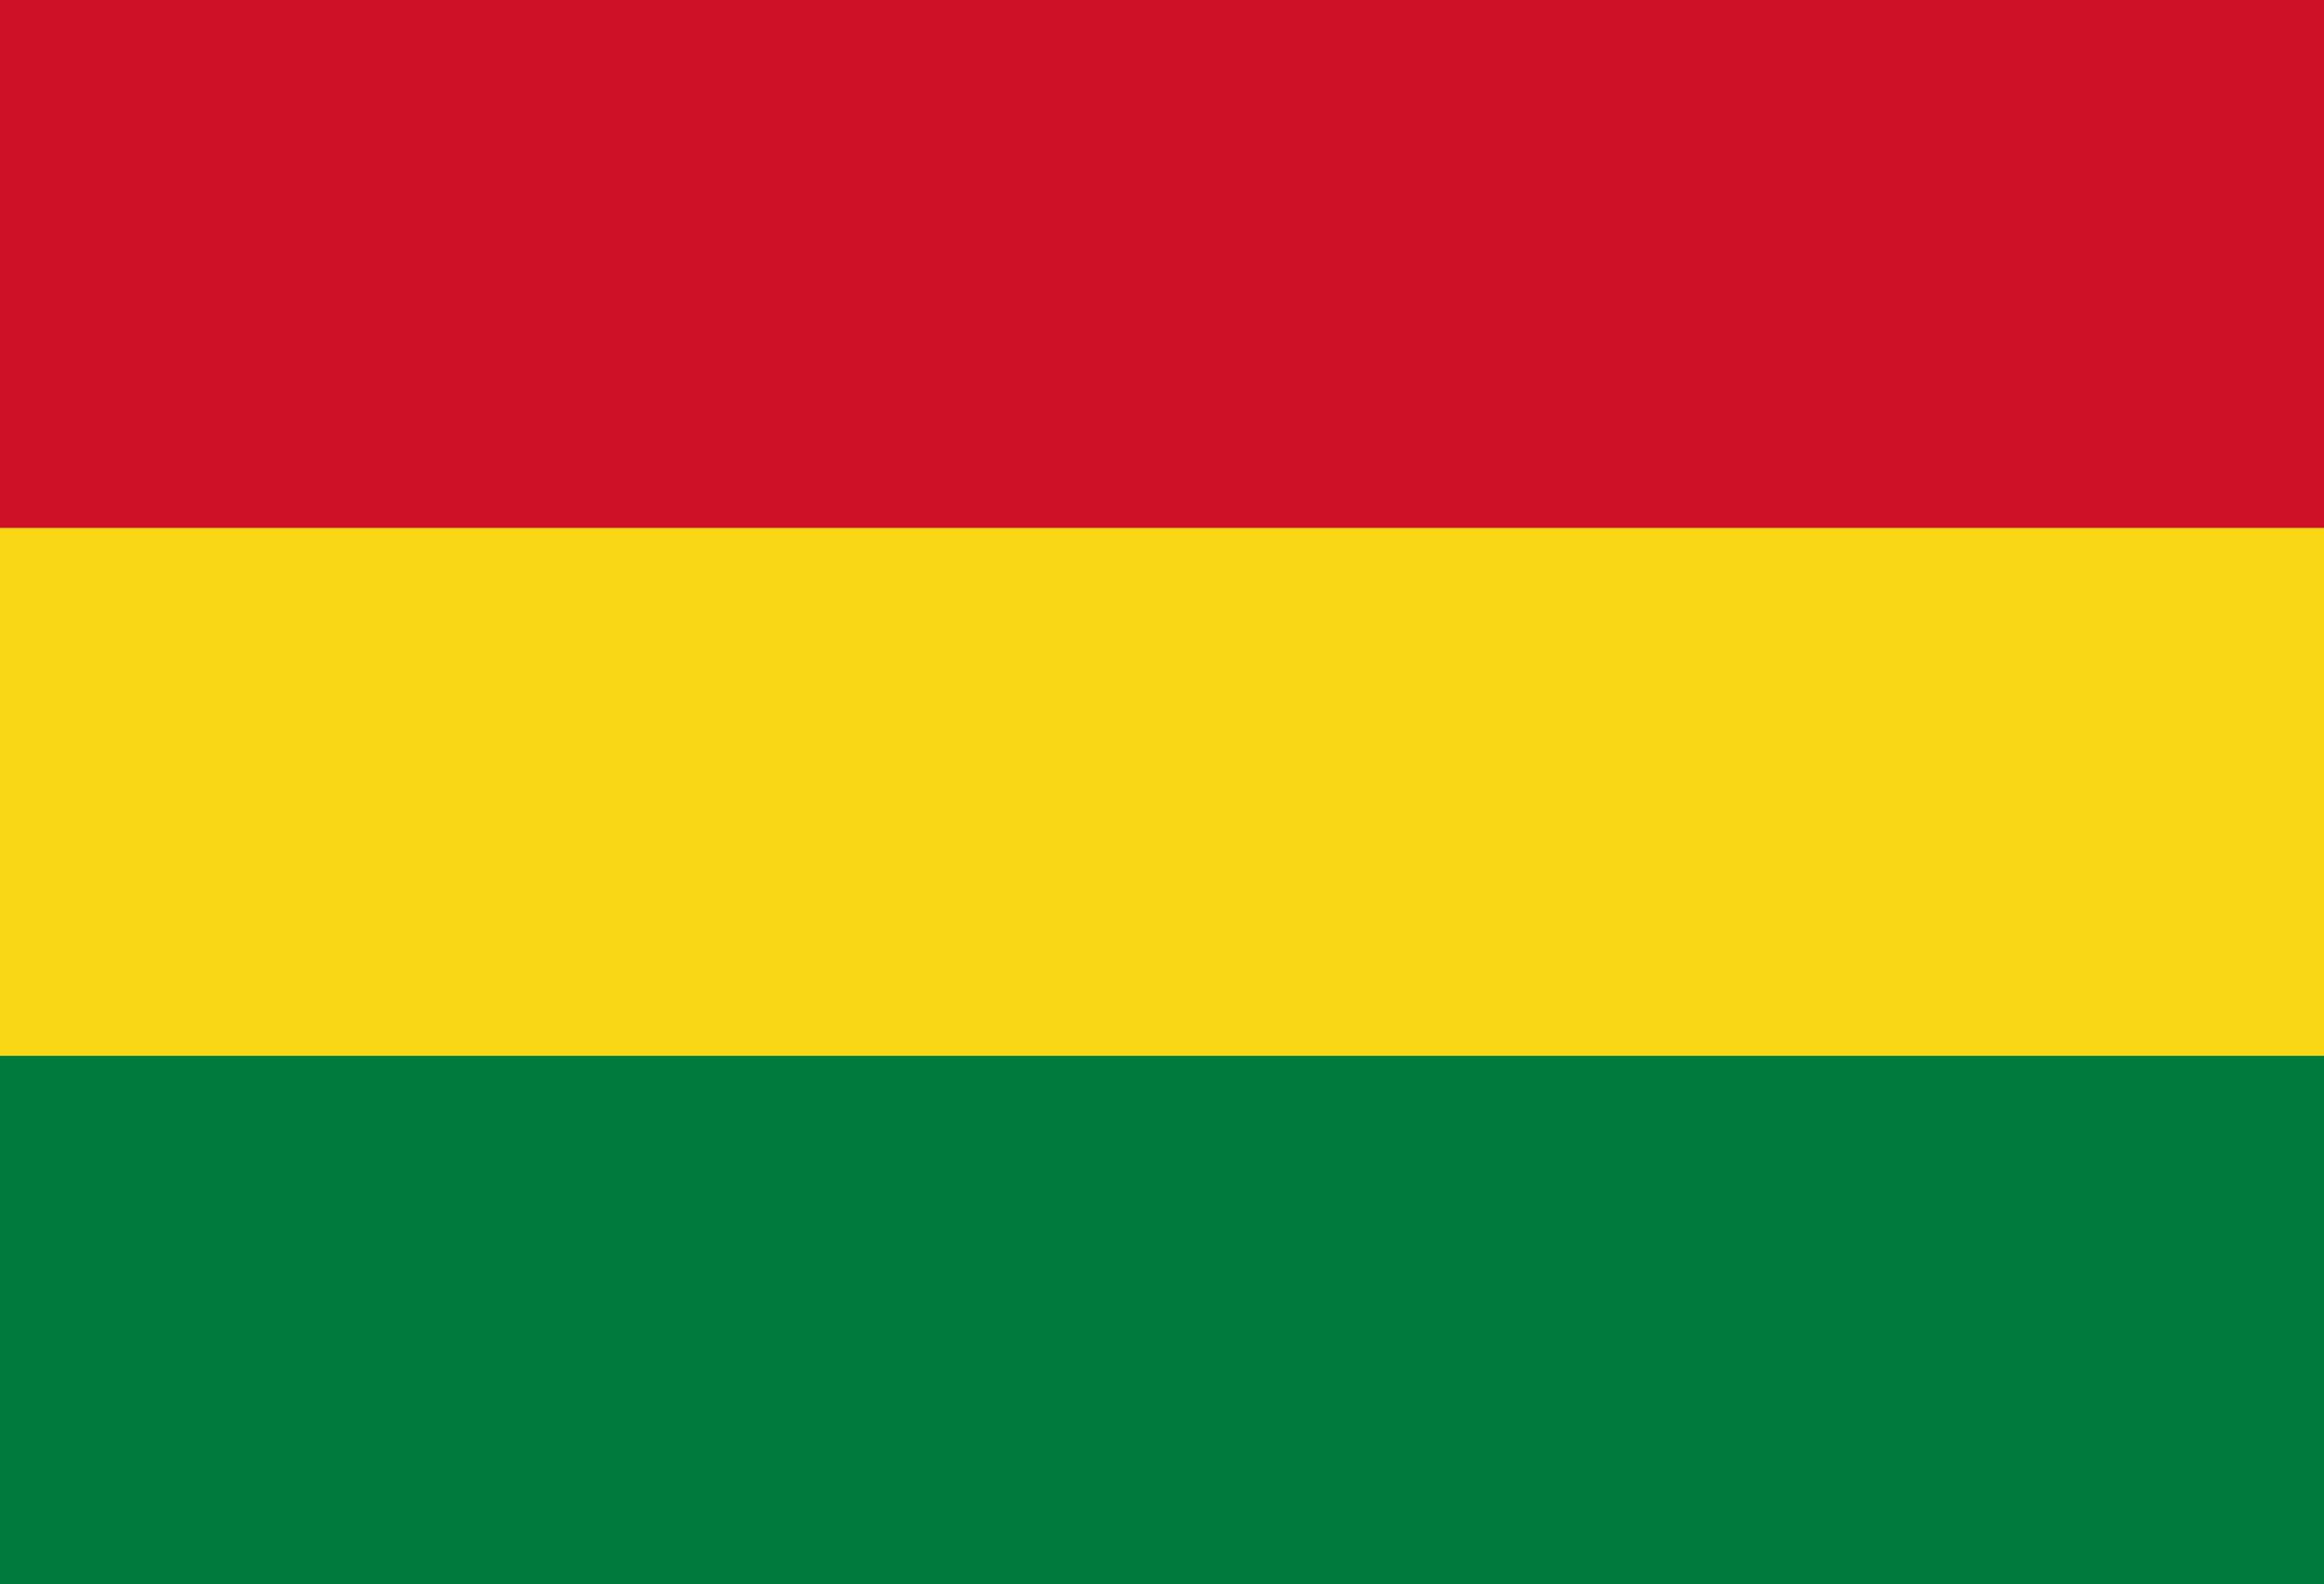 बोलीविया, देश, emblema, लोग�प्रतीकbolo - HD वॉलपेपर - प्रोफेसर-falken.com